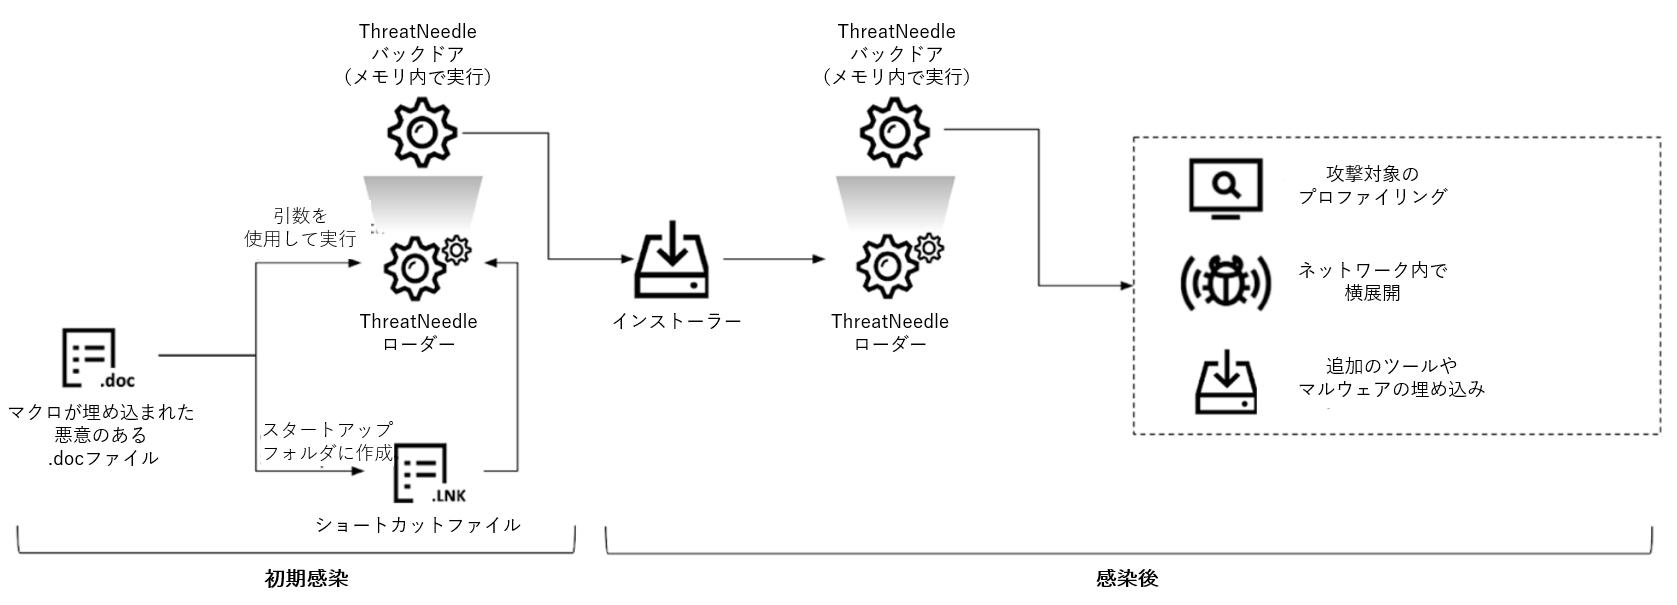 KL-ThreatNeedle-1.png